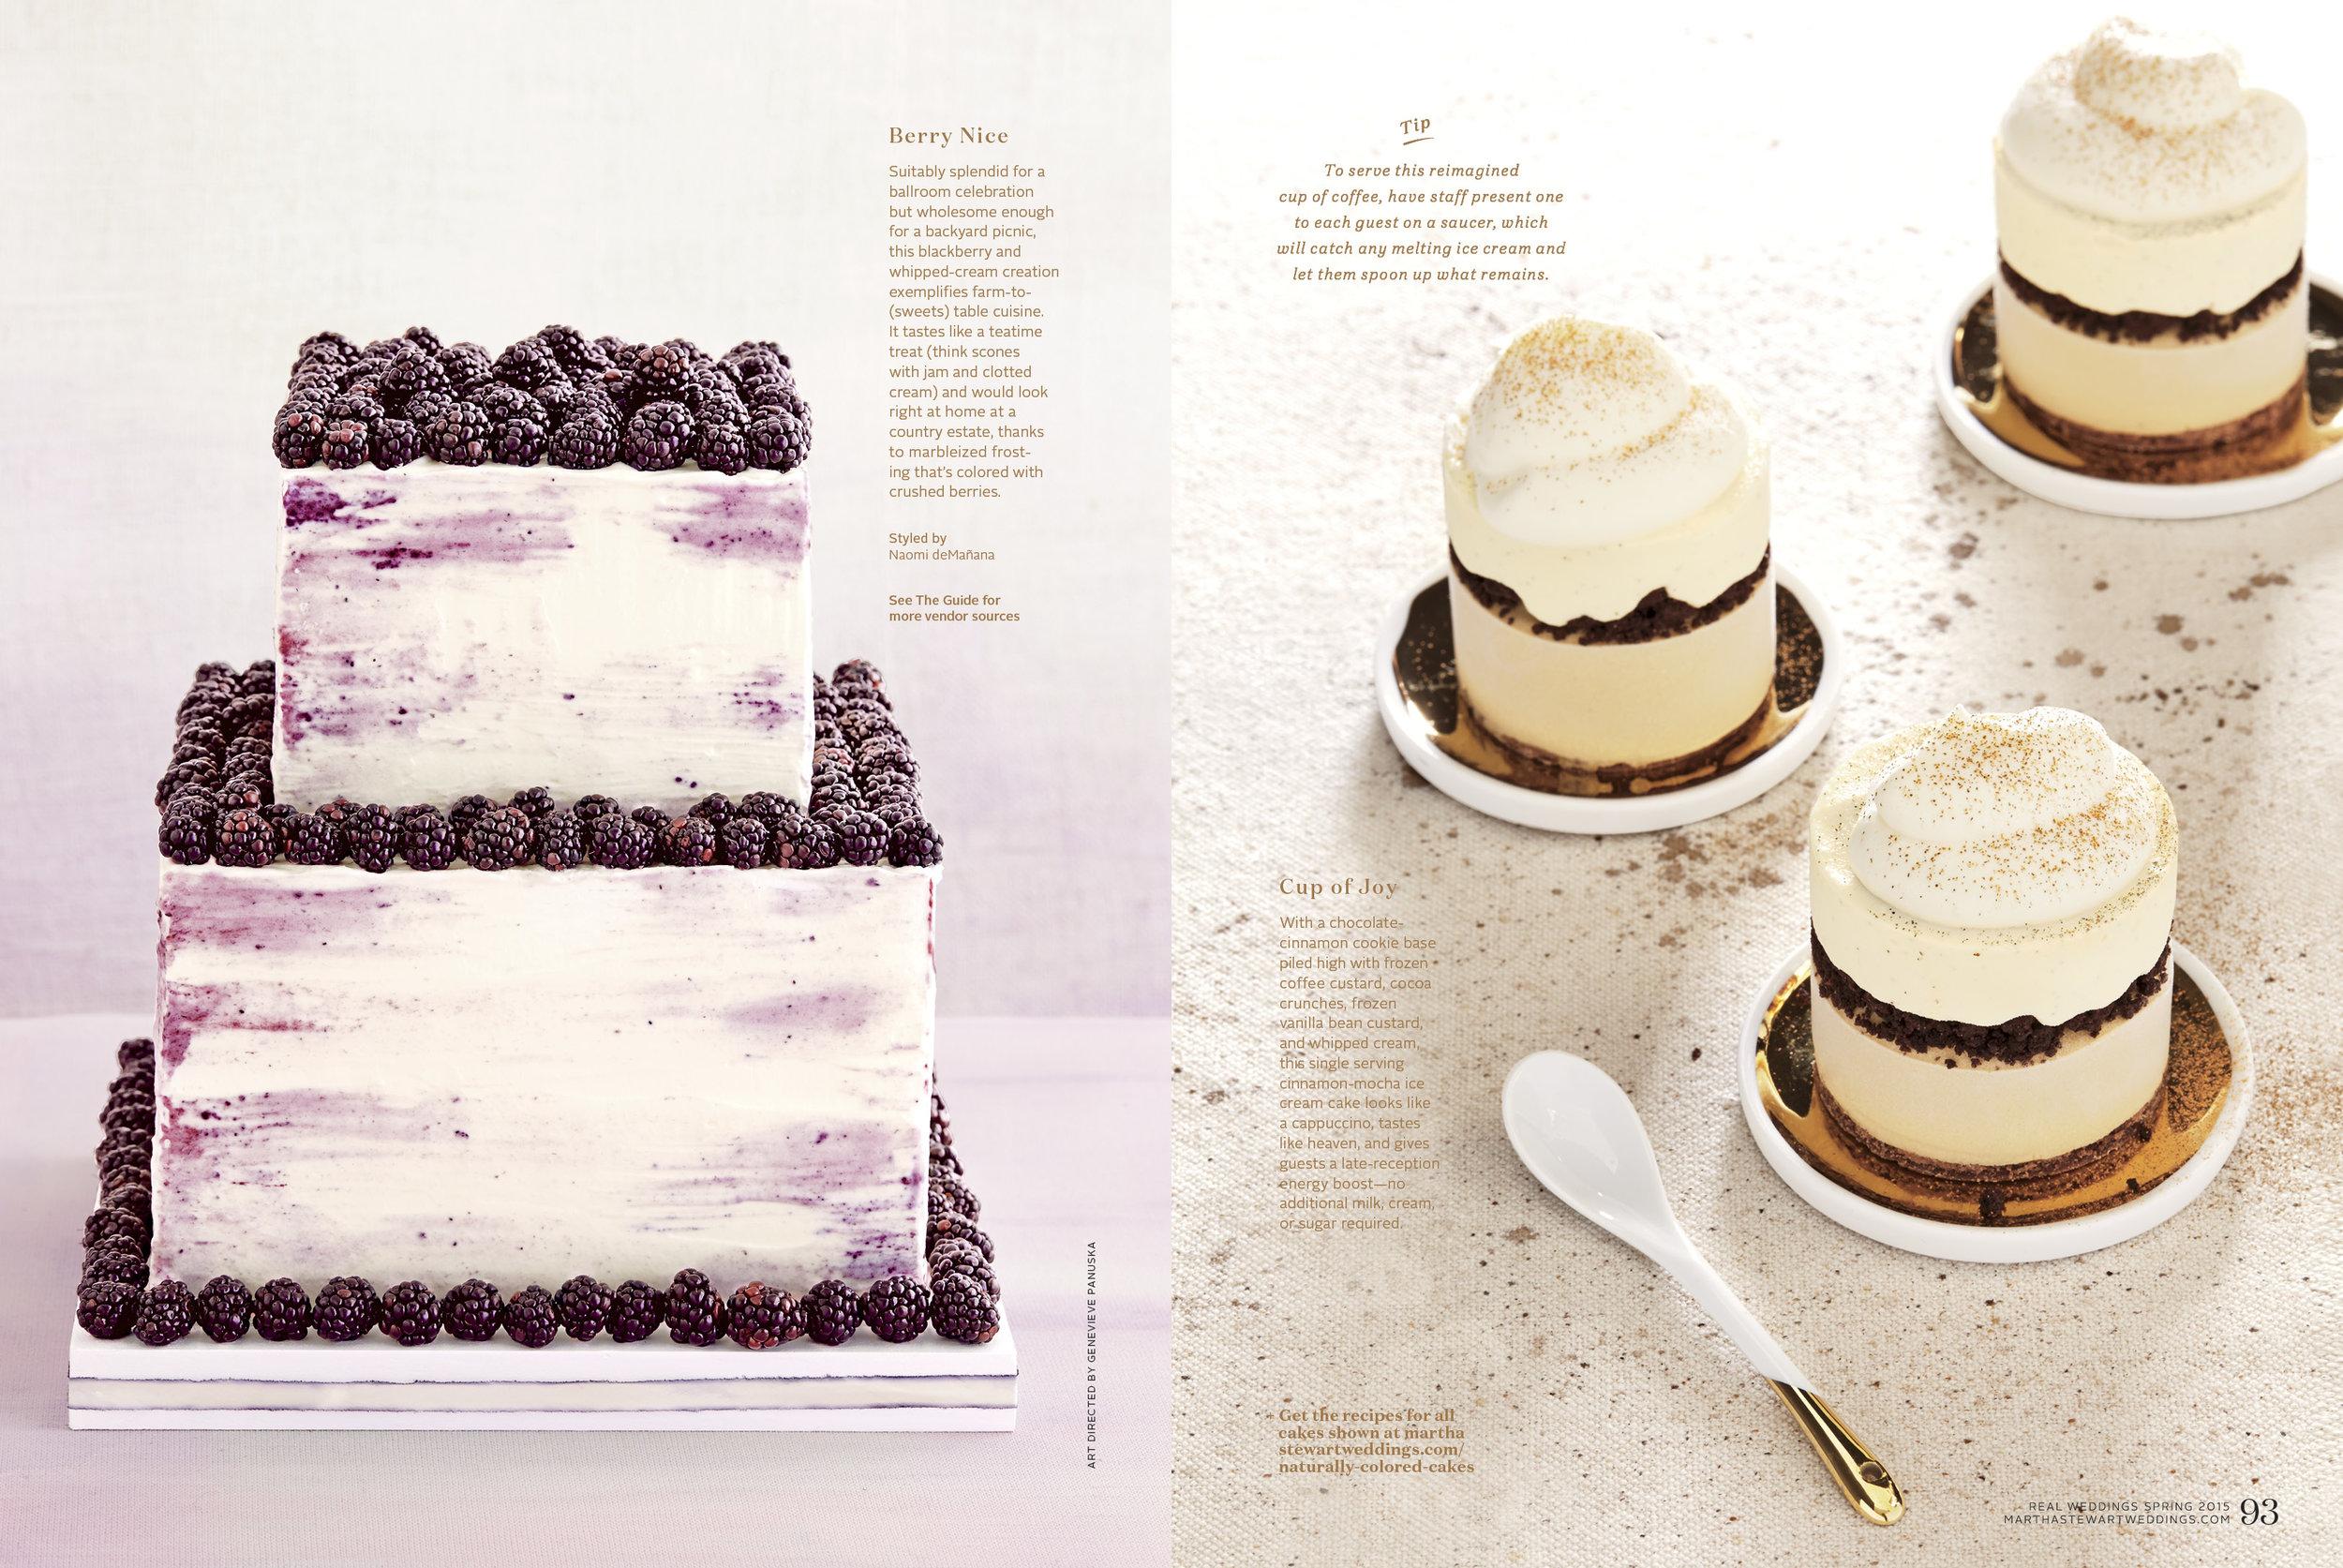 Blackberry And Cream Cake Mocha Ice Cakes Martha Stewart Weddings